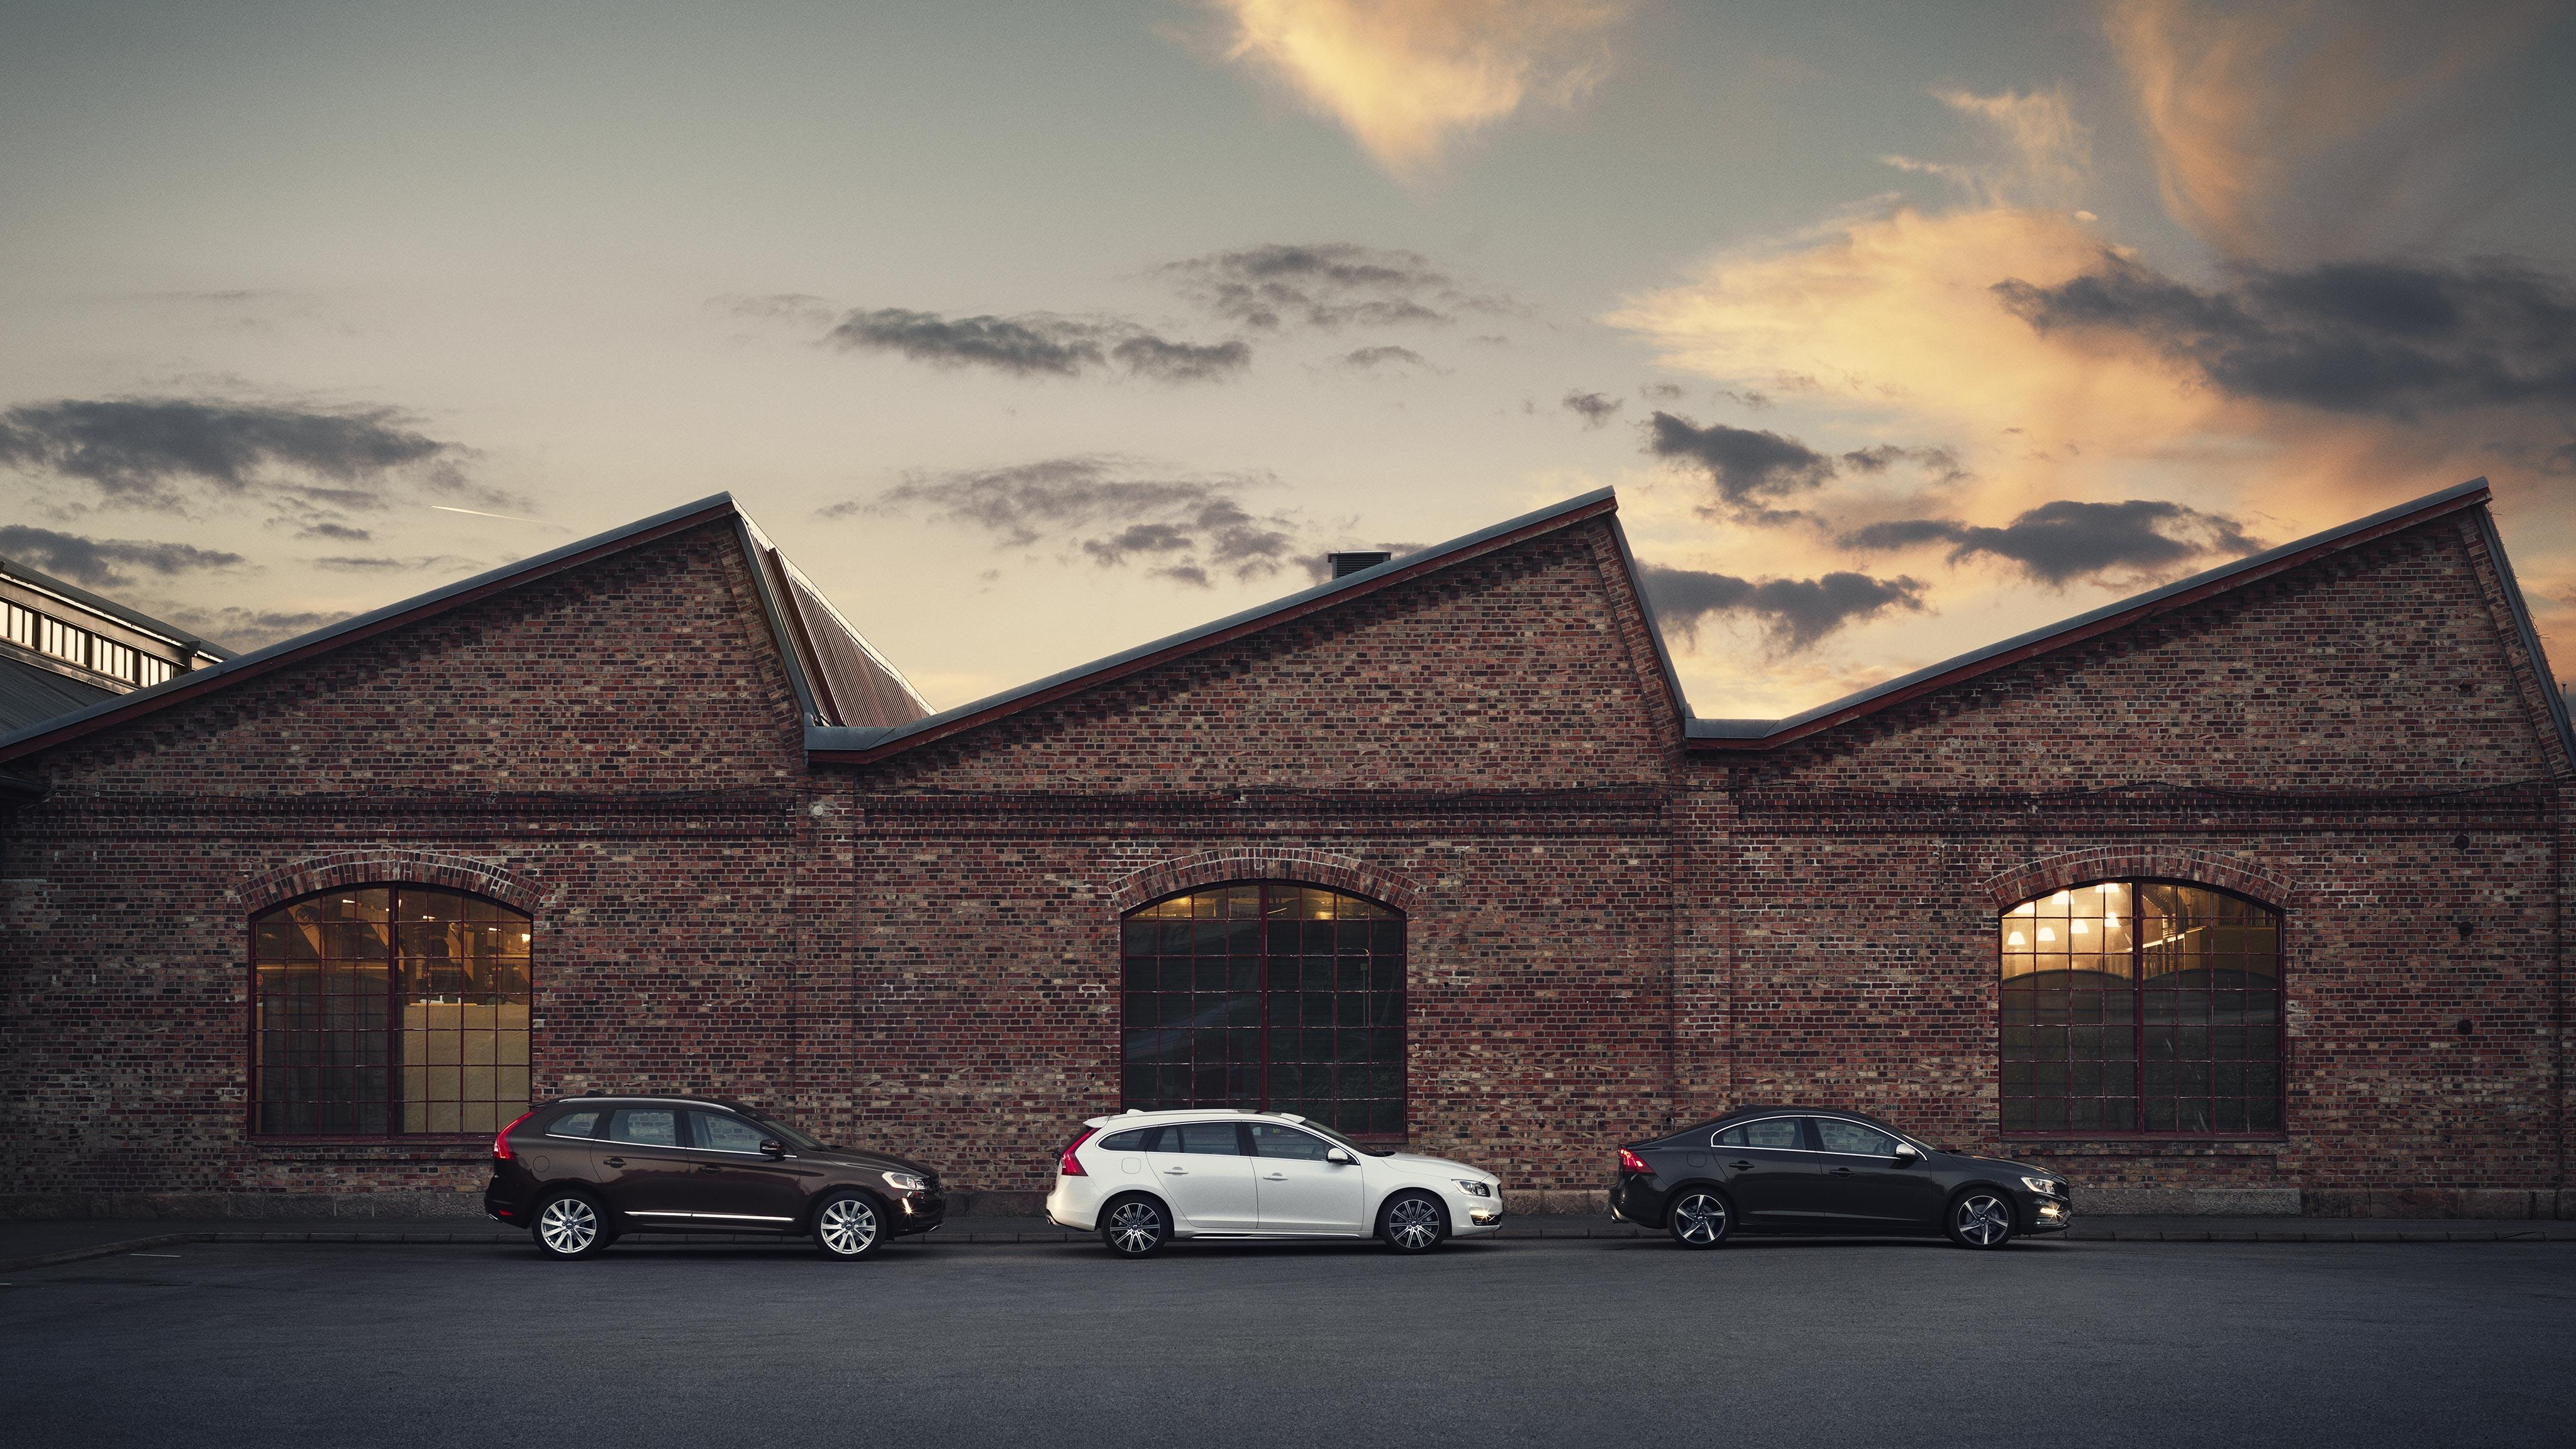 Volvo-factory-Hero-4096x2304-image-v1.jpg